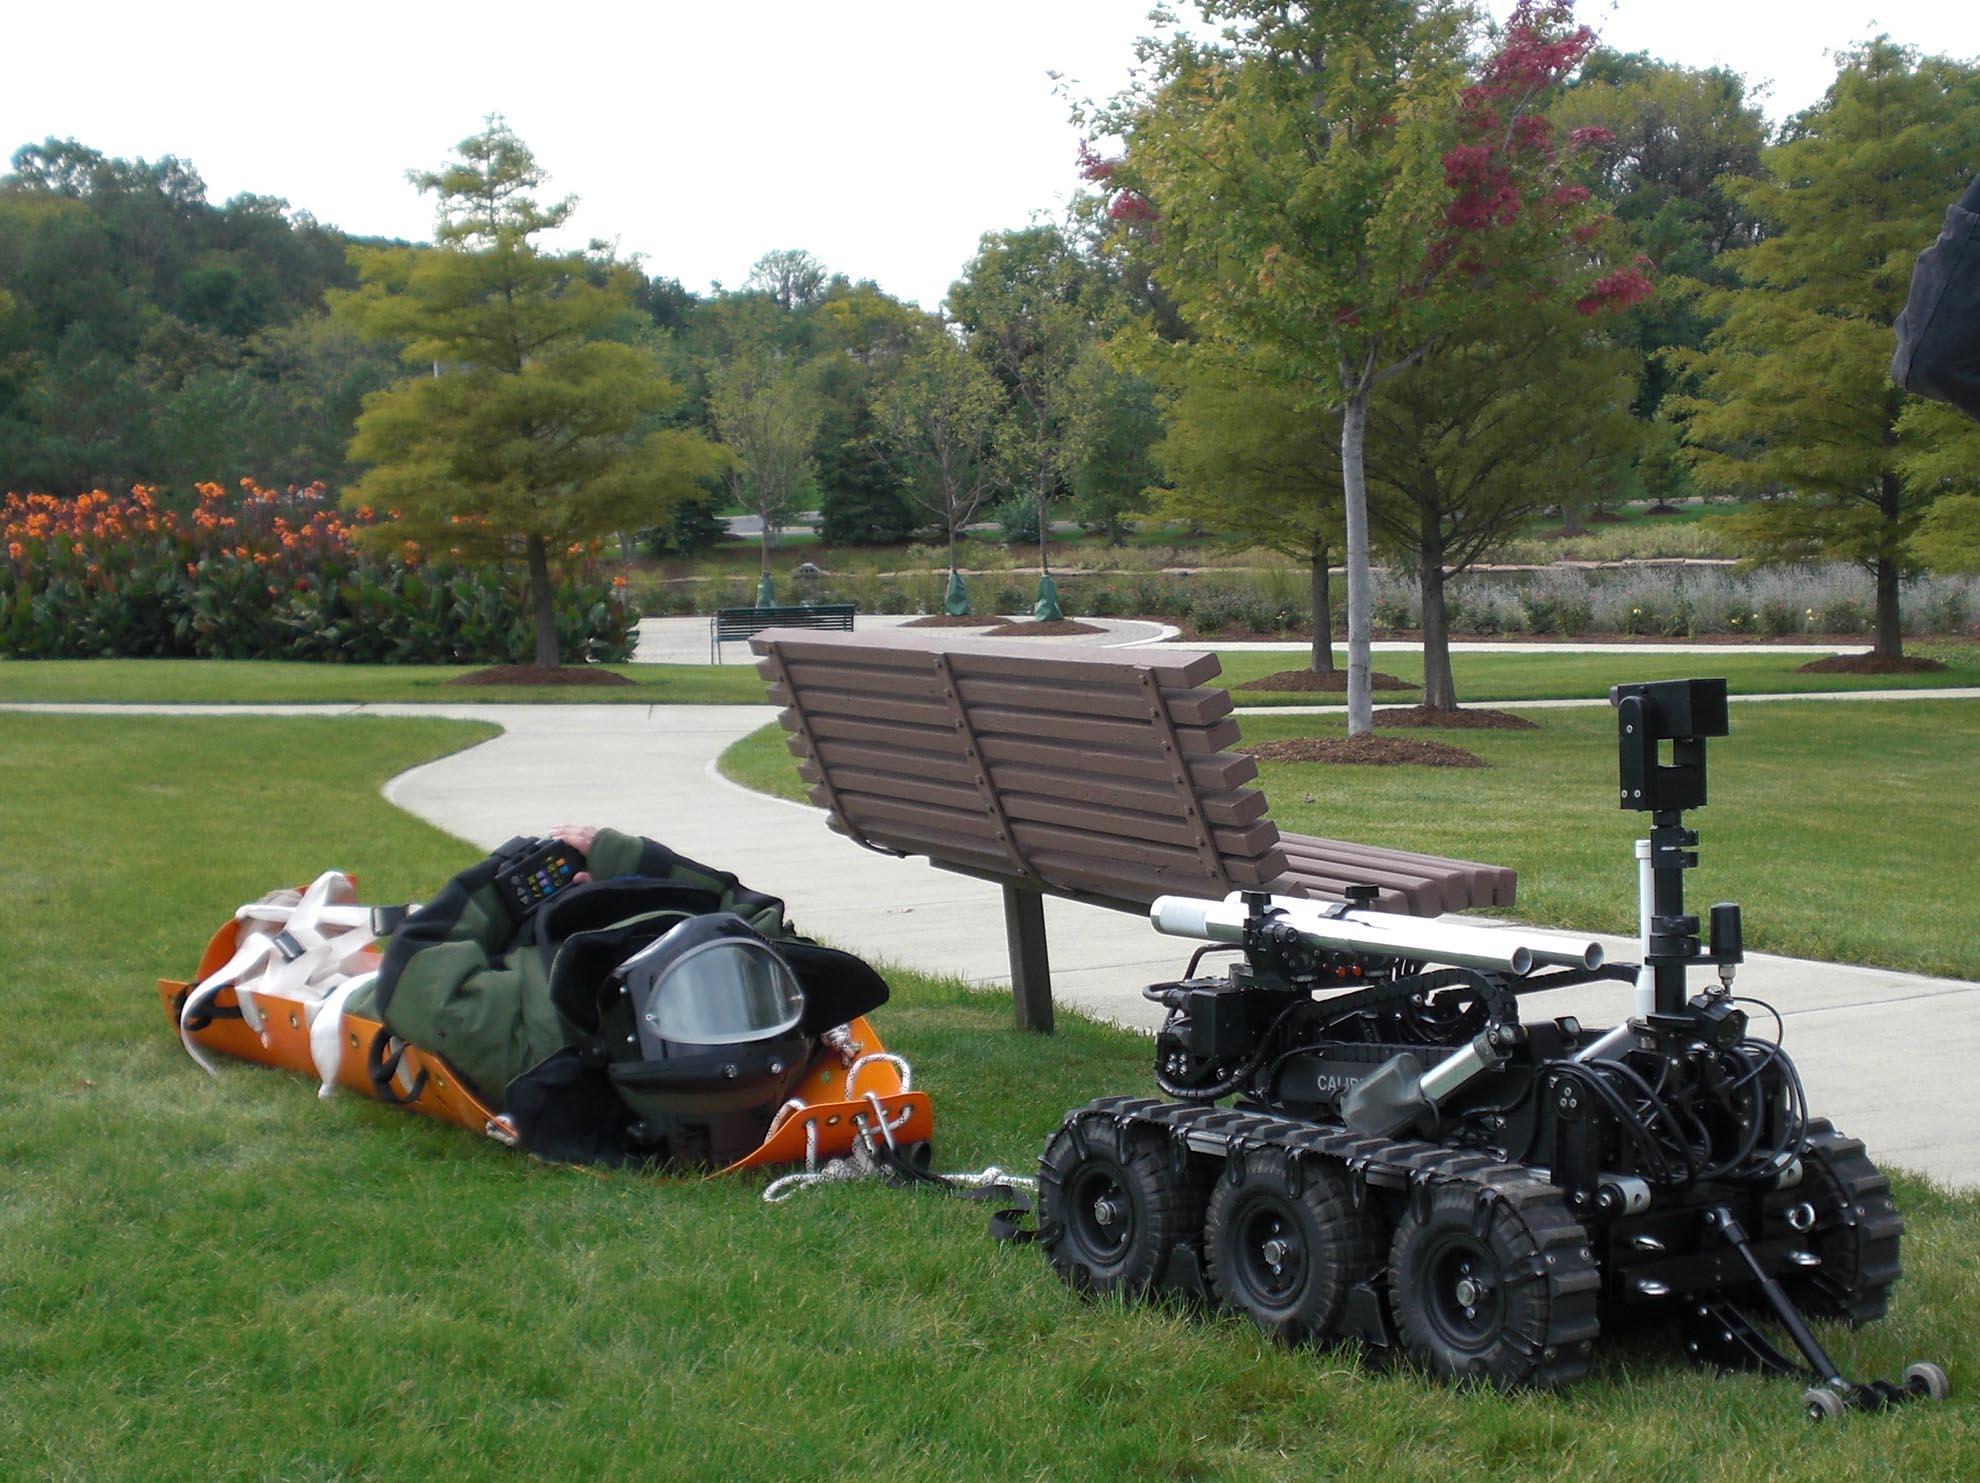 mk3-caliber-eod-robot-tow-bomb-suit